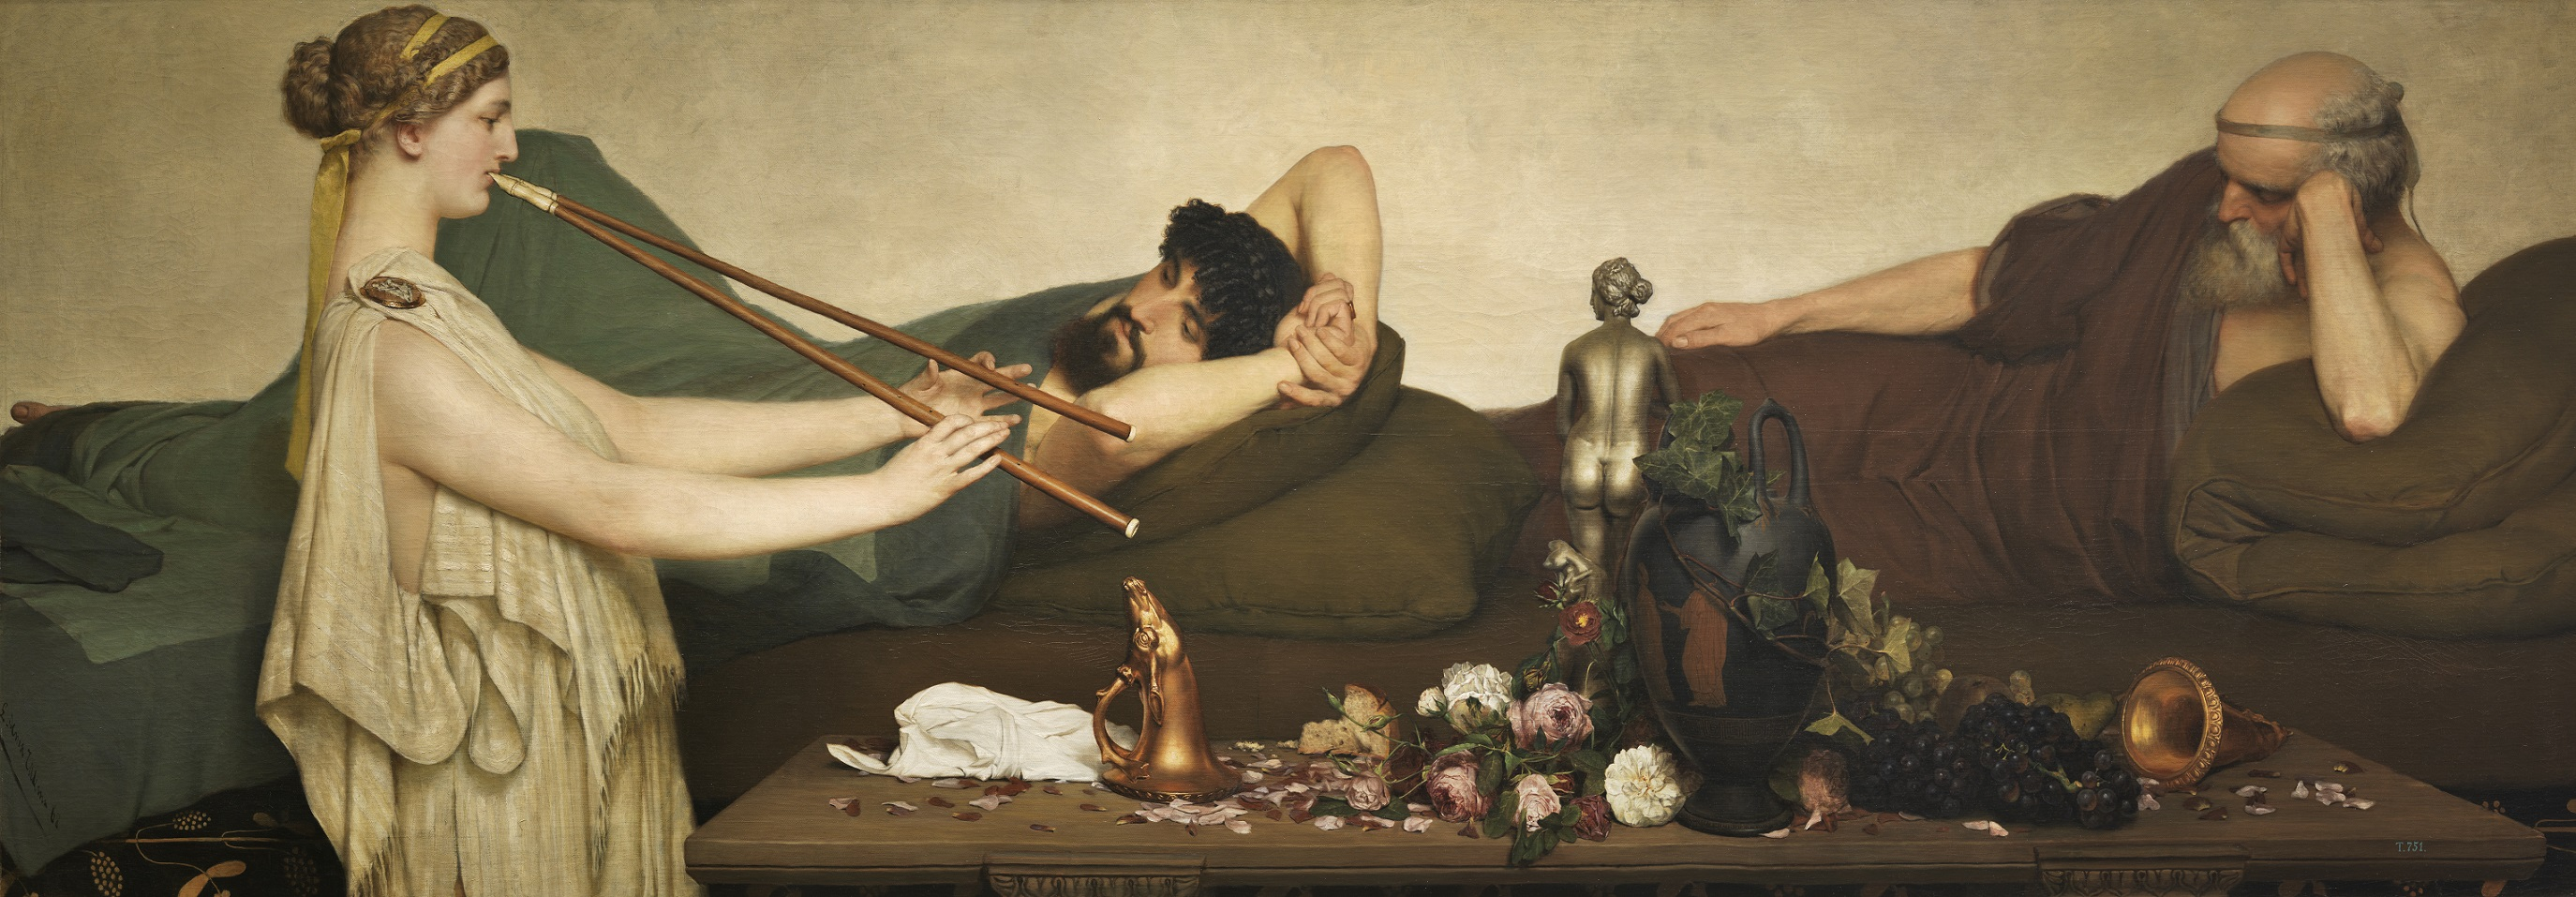 Lawrence Alma-Tadema. La siesta.